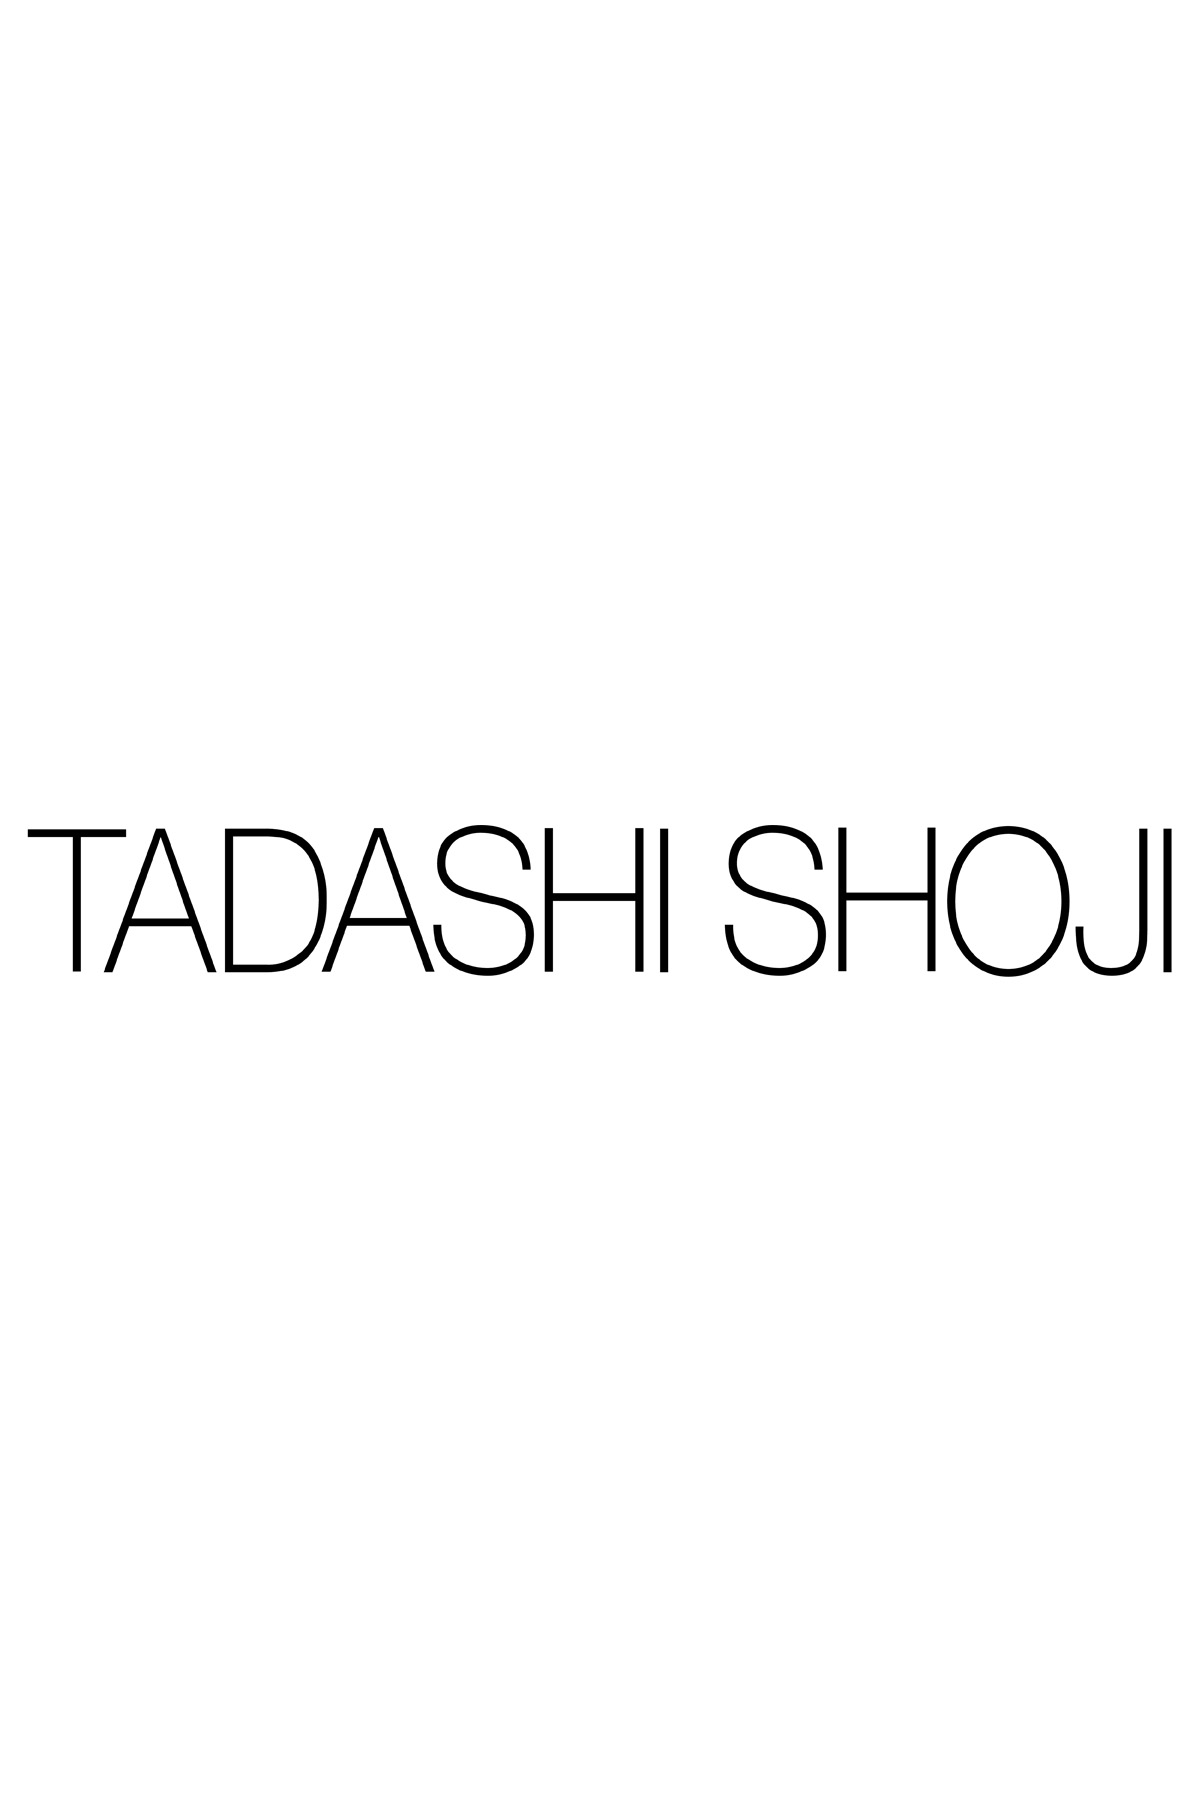 Tadashi Shoji - Embroidered Lace V-Neck Dress with Ribbon Detail in Aqua